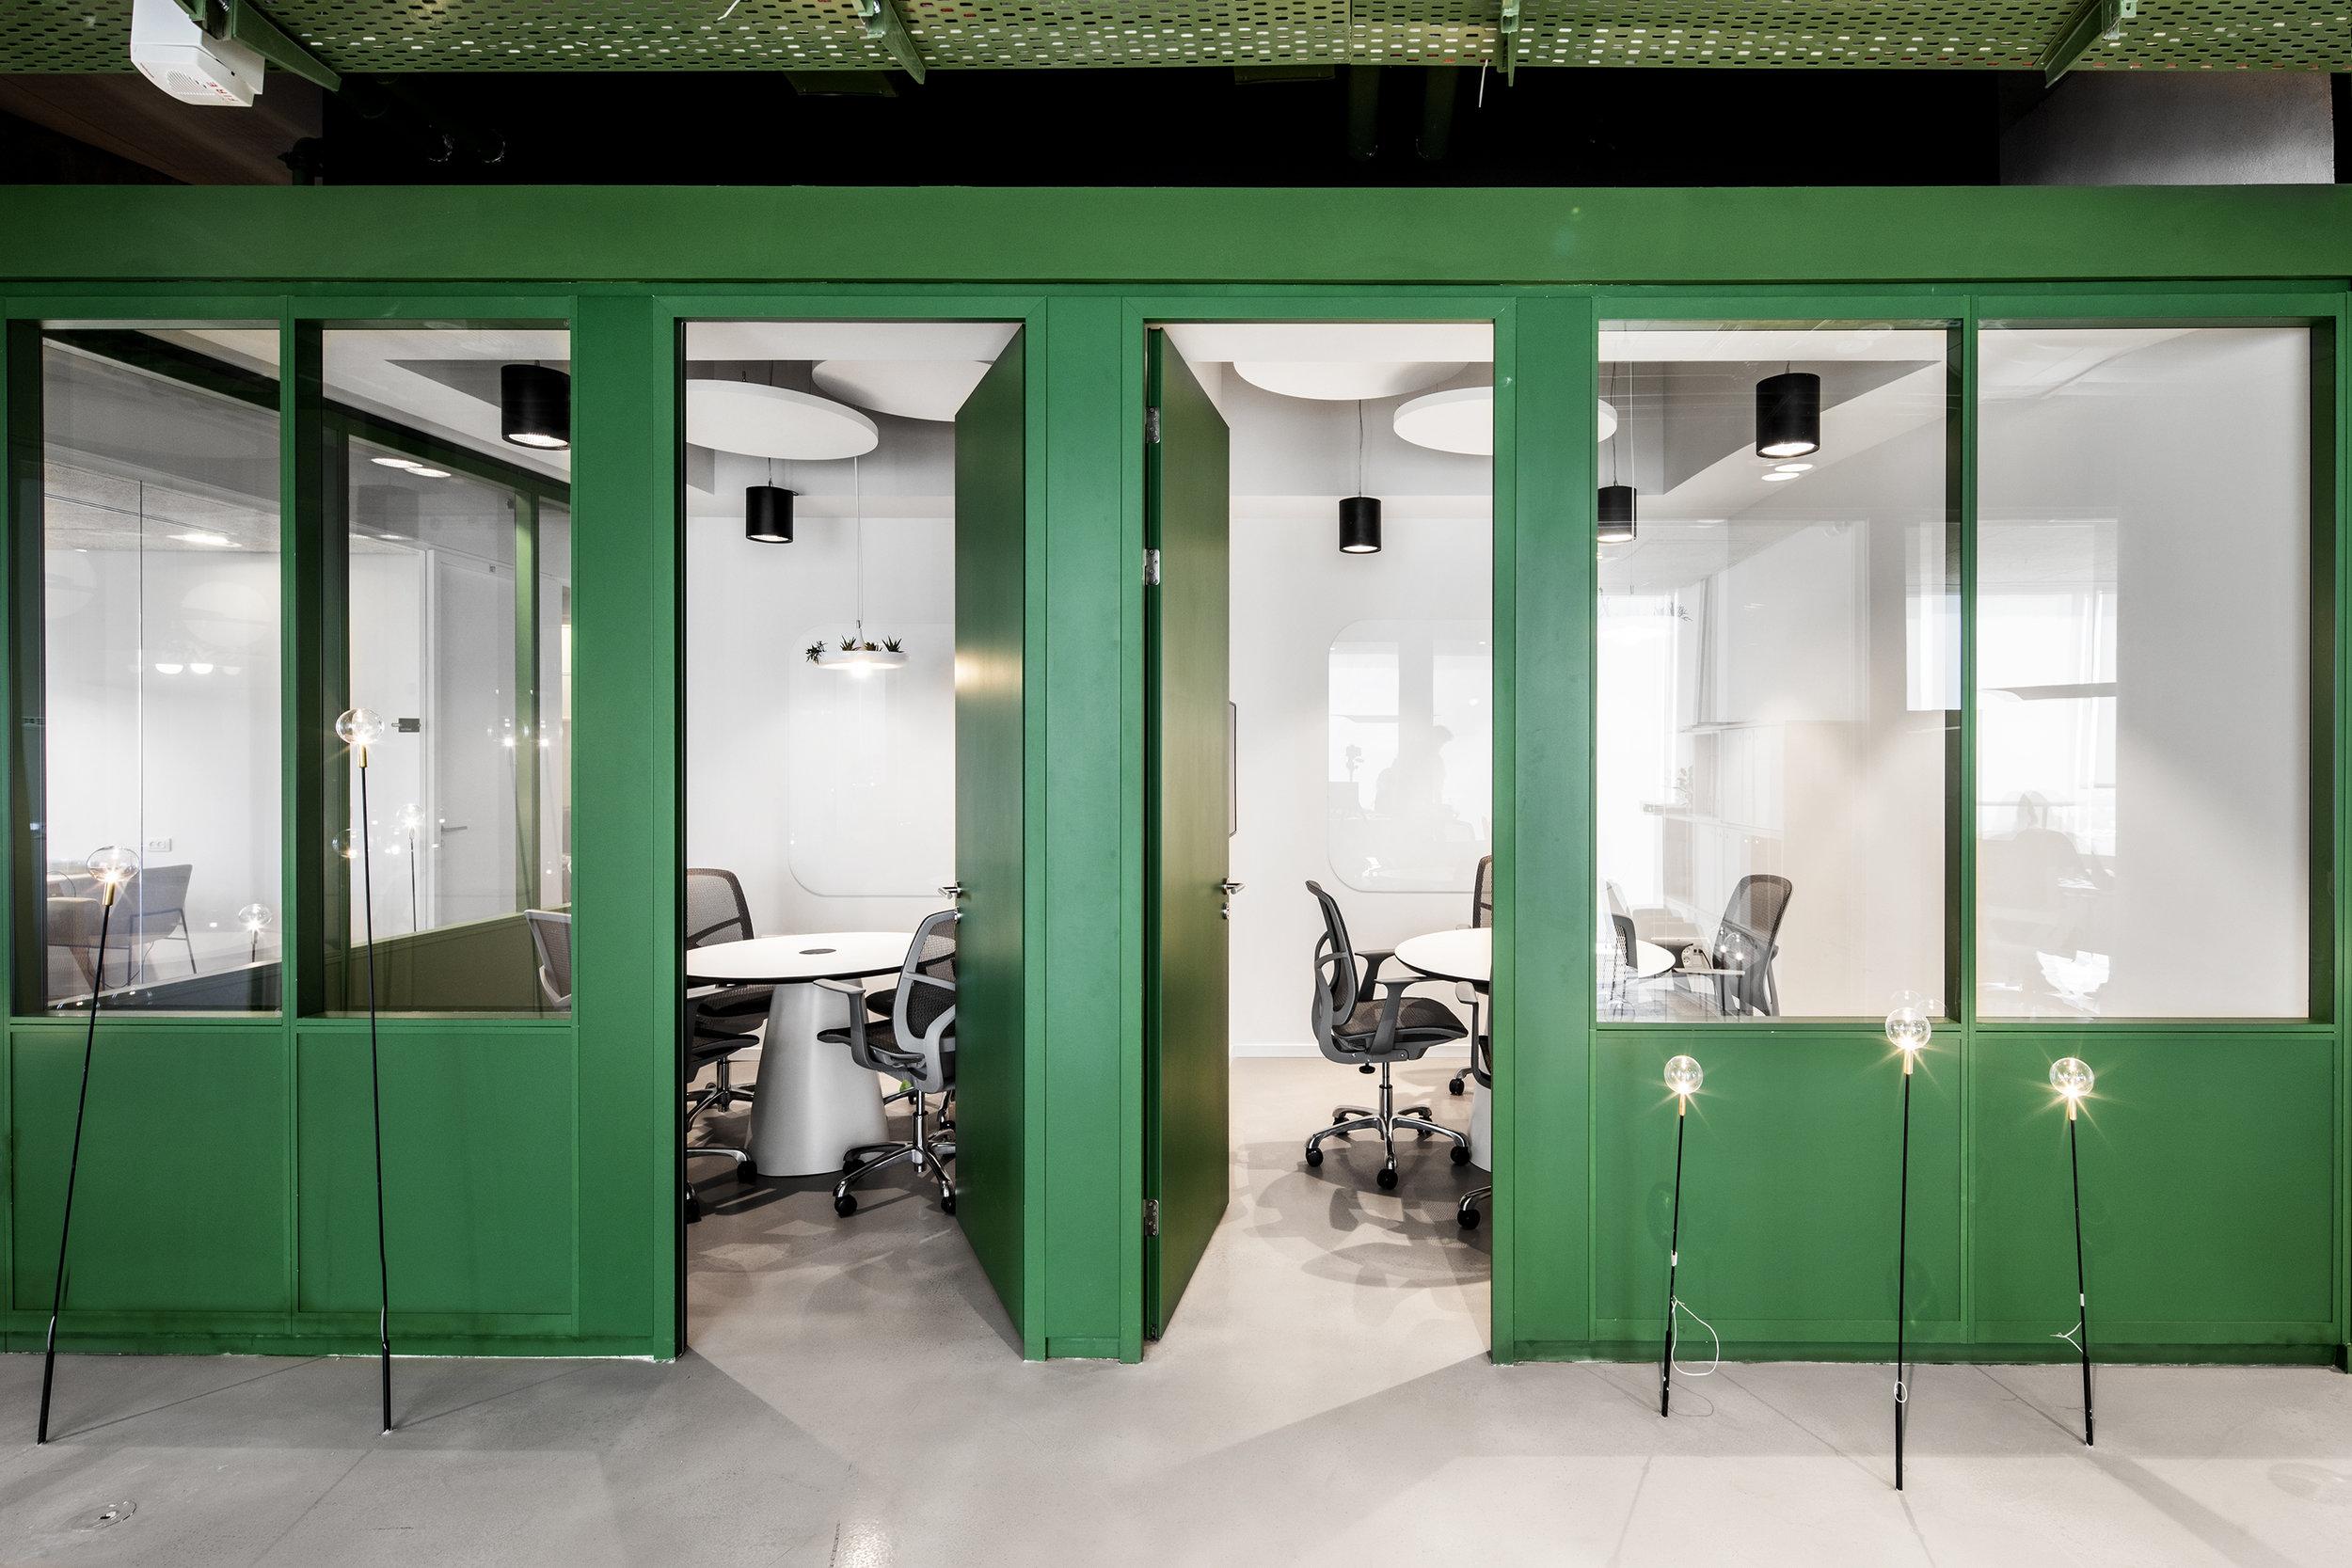 HINNOMAN - ROY DAVID ARCHTECTURE - STUDIO - סטודיו רואי דוד - אדריכלים (24).jpg